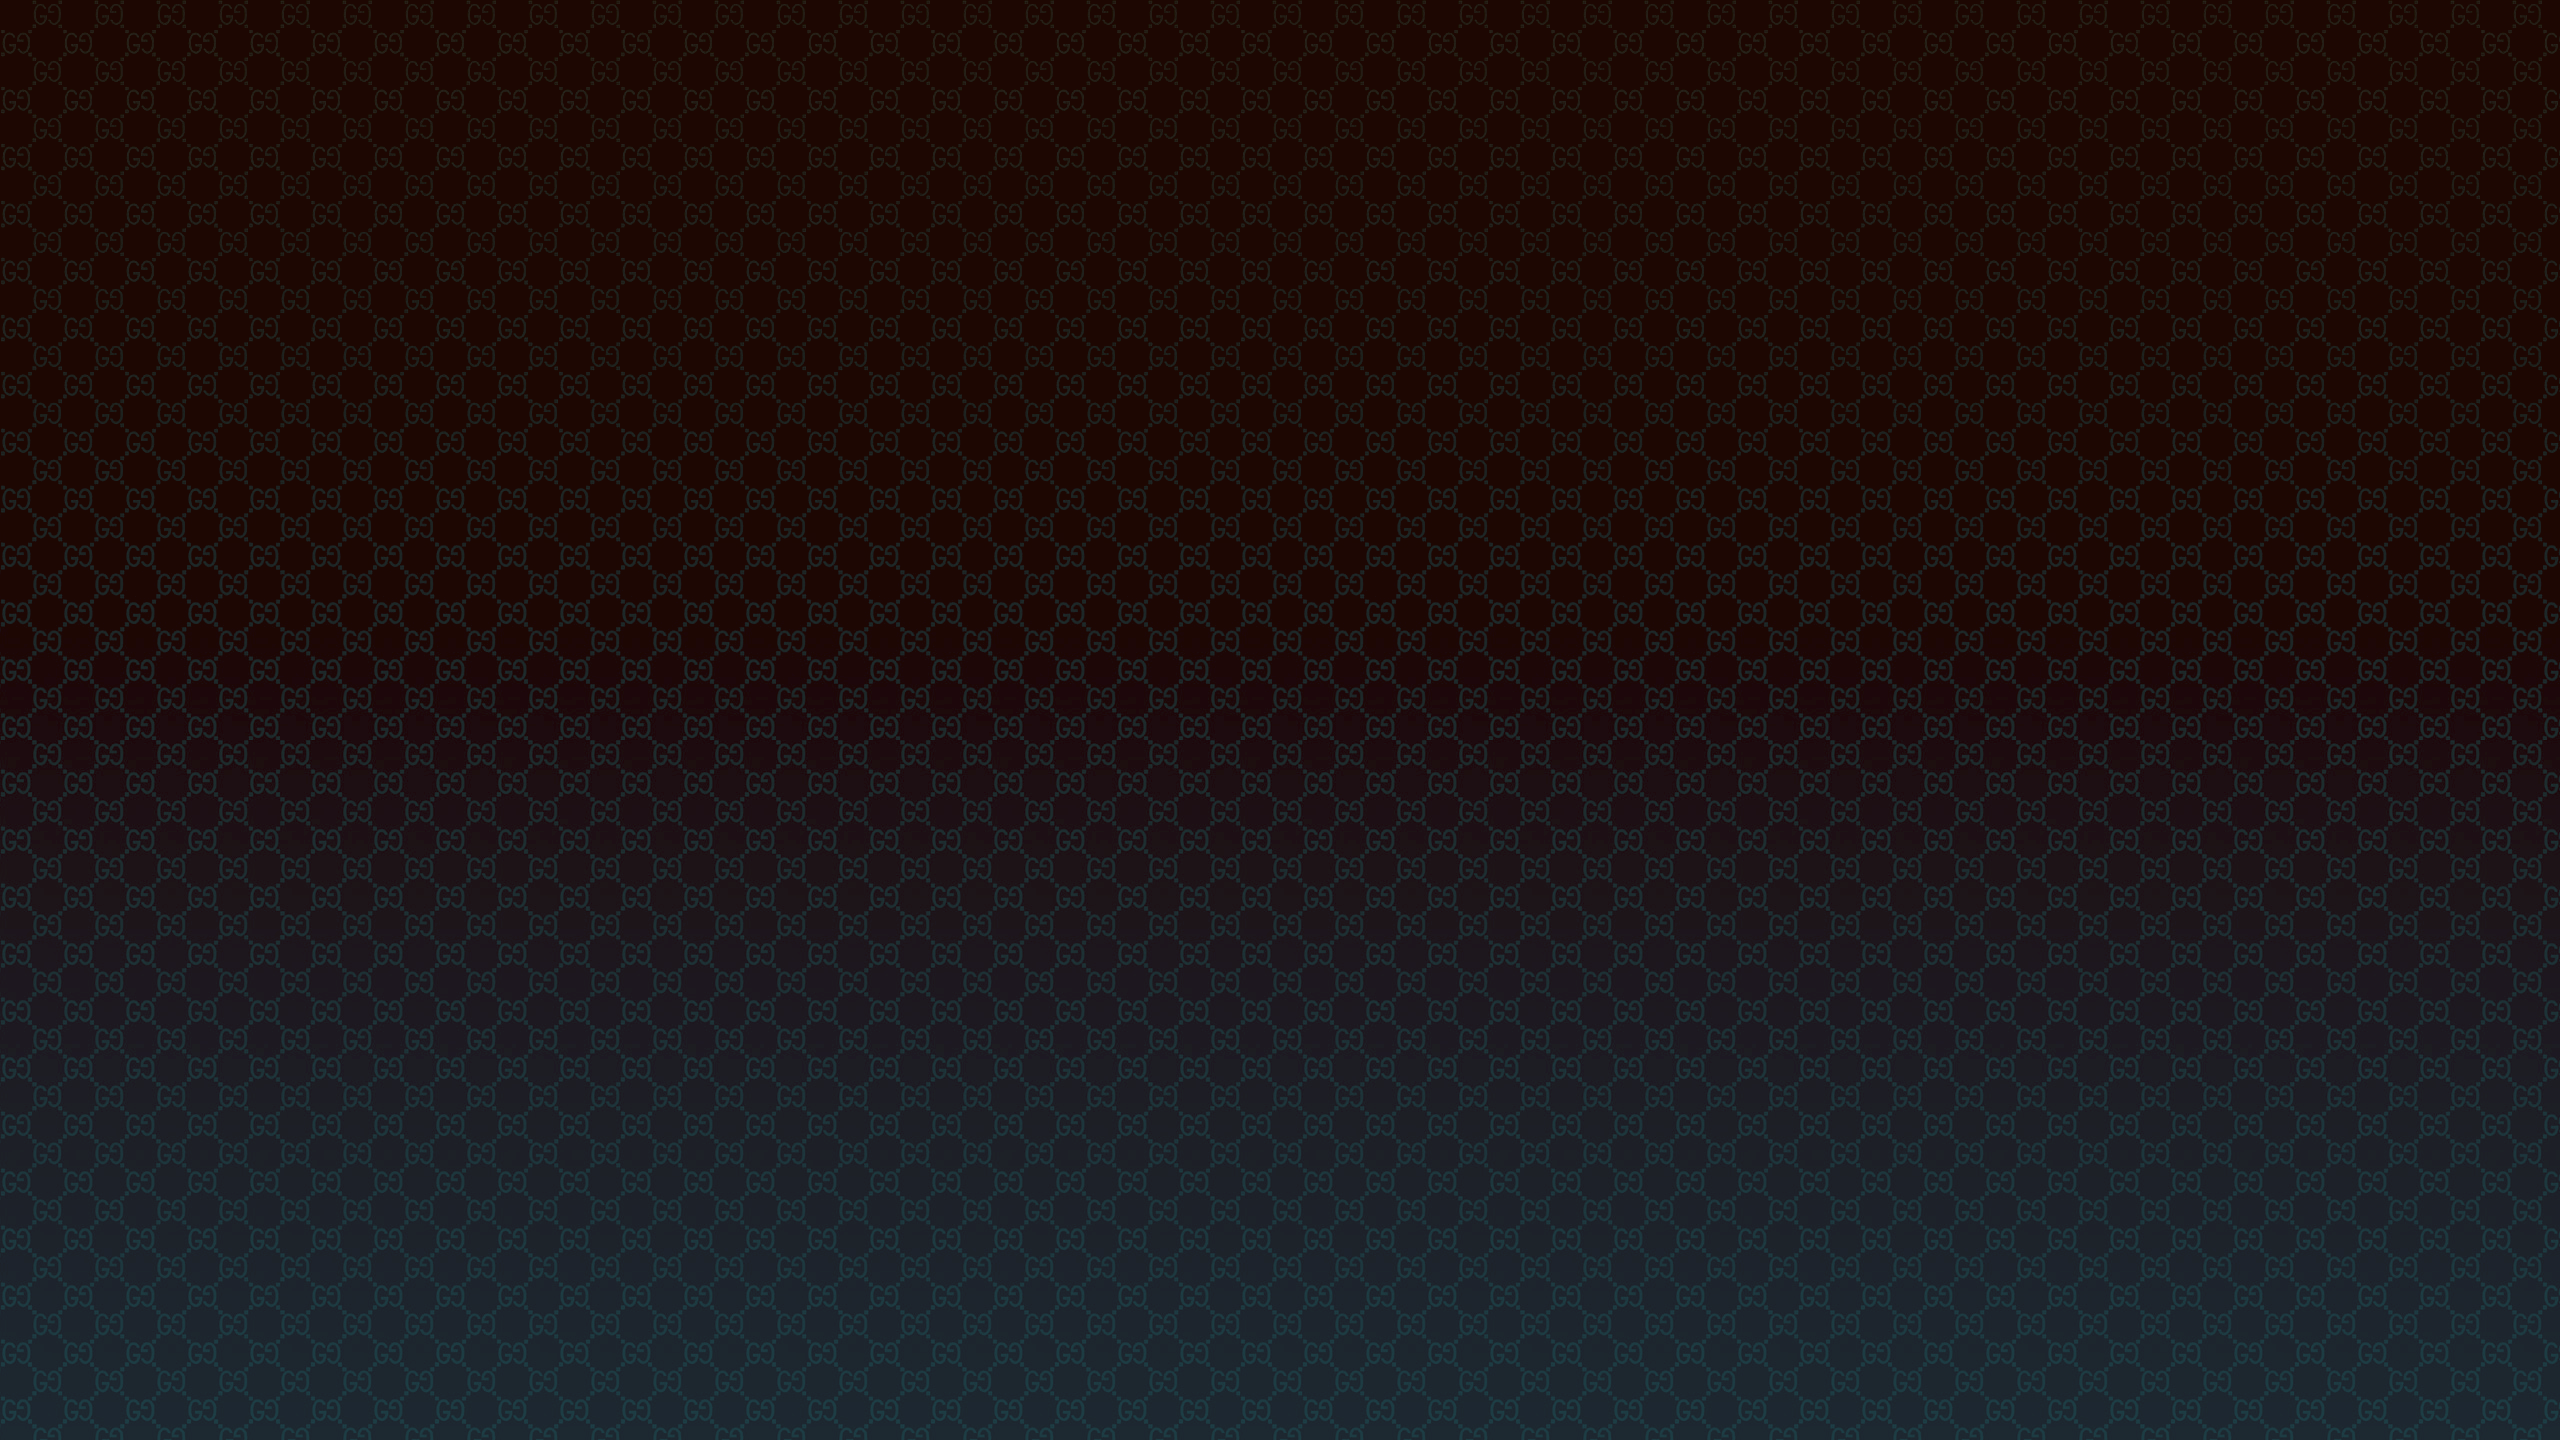 3d Painting Hd Wallpaper Gucci Wallpapers Hd Pixelstalk Net